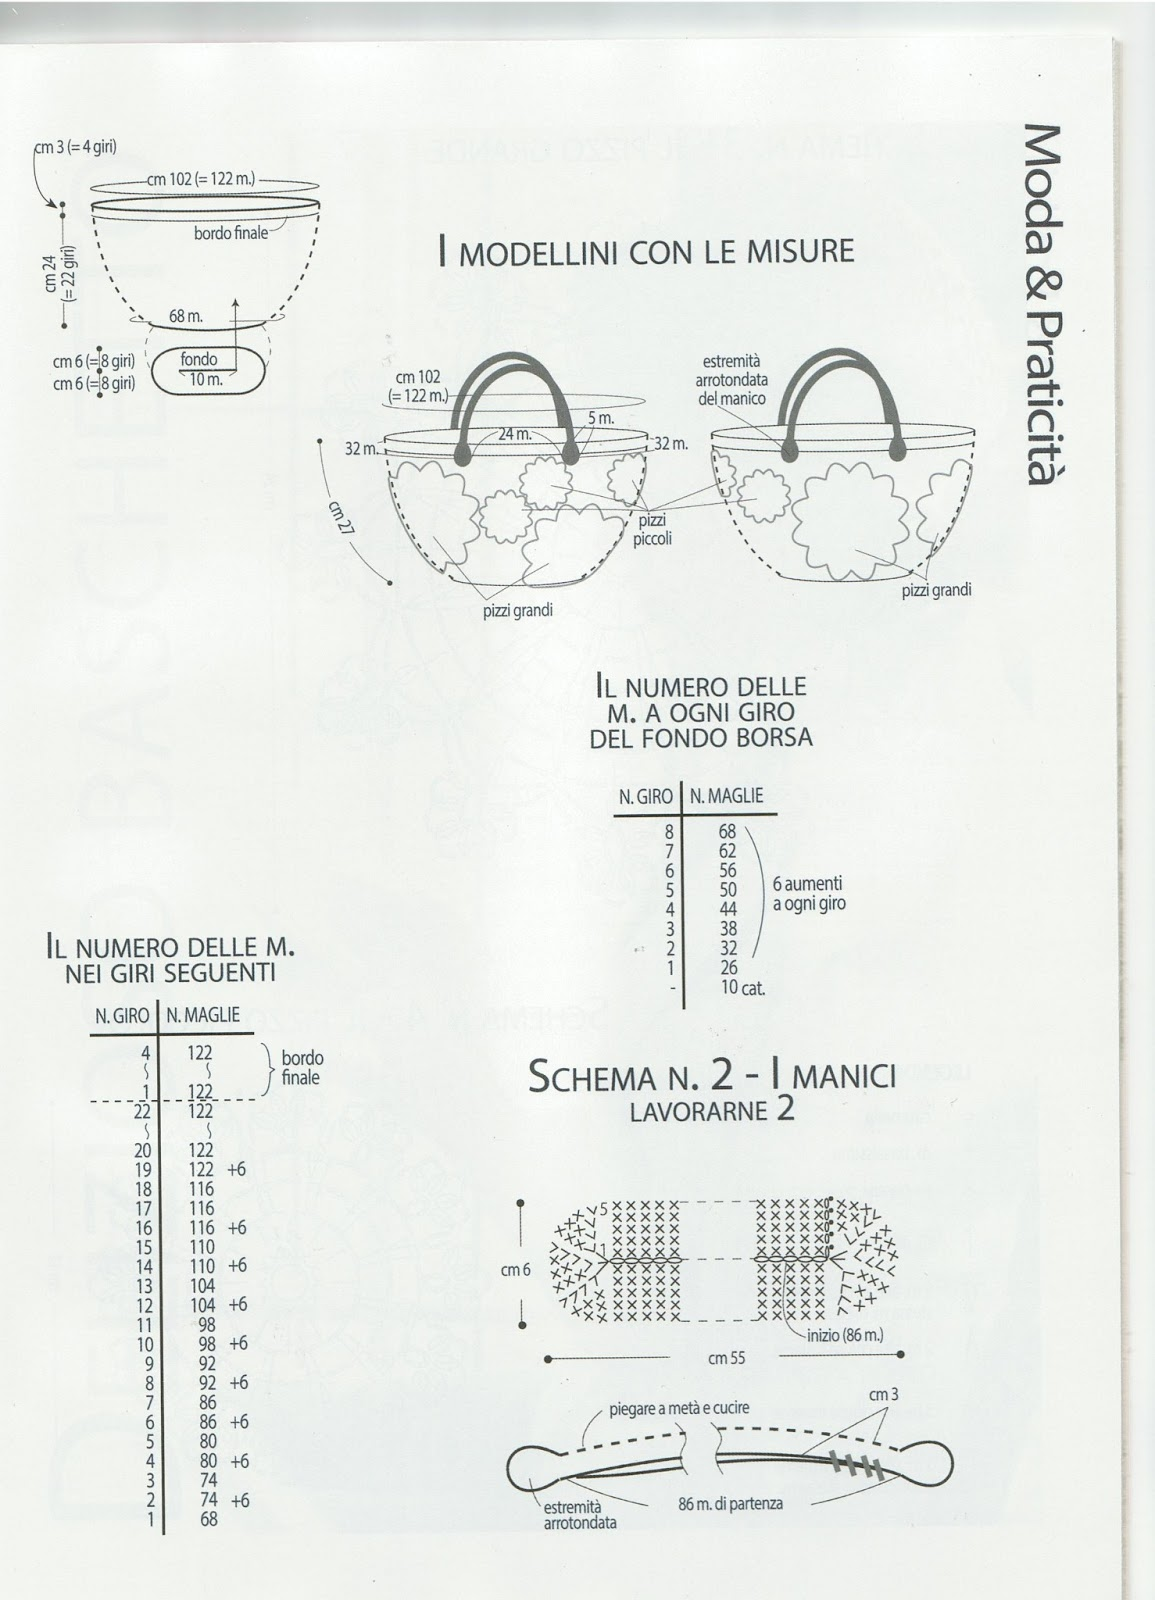 1969 gmc c k